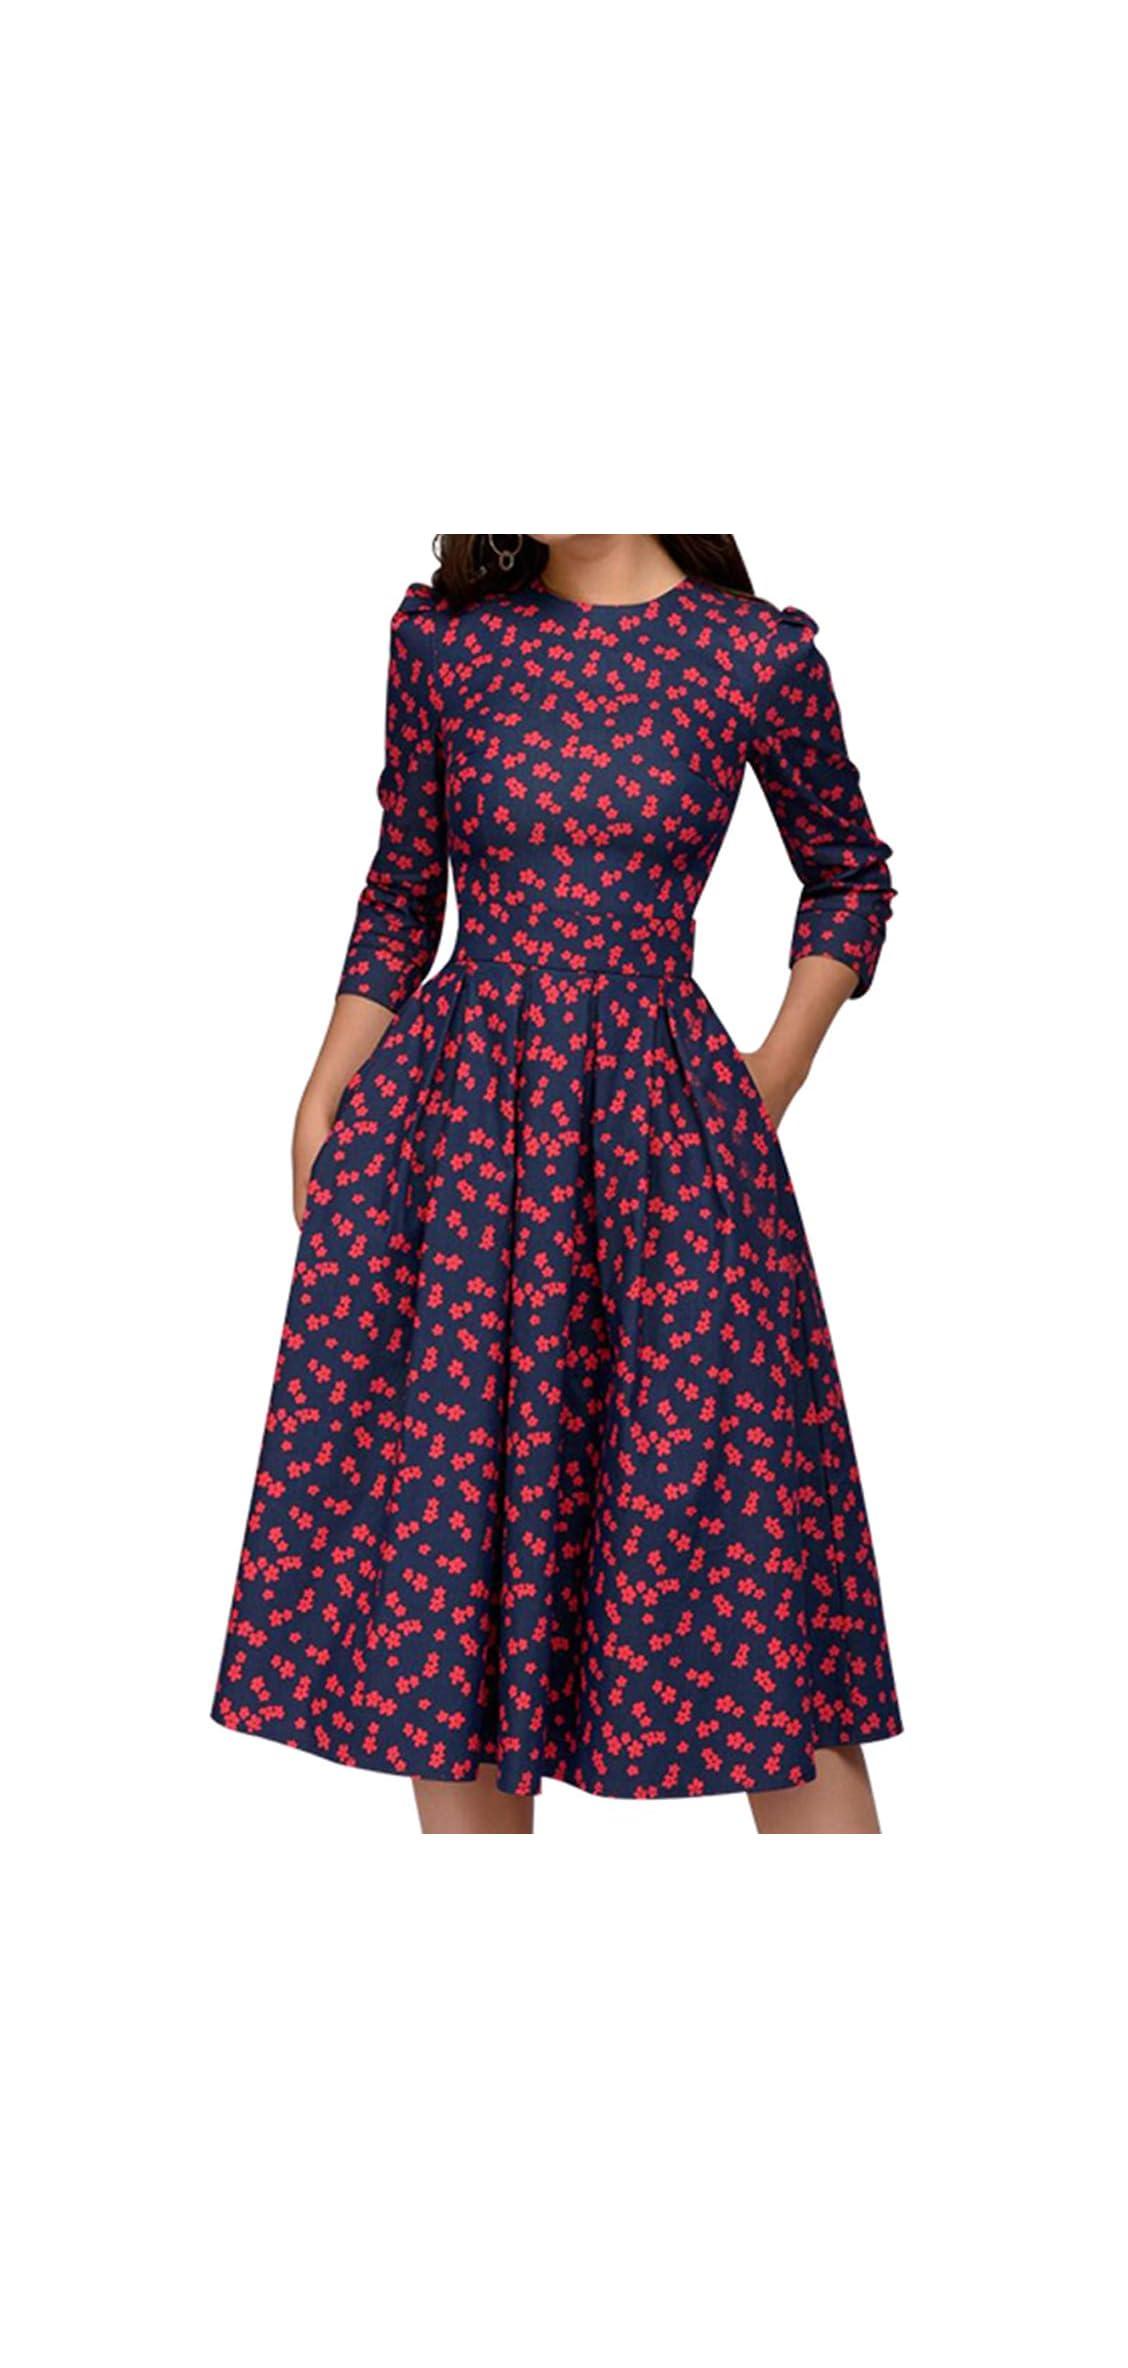 Women's Floral Vintage Dress Elegant Midi Evening